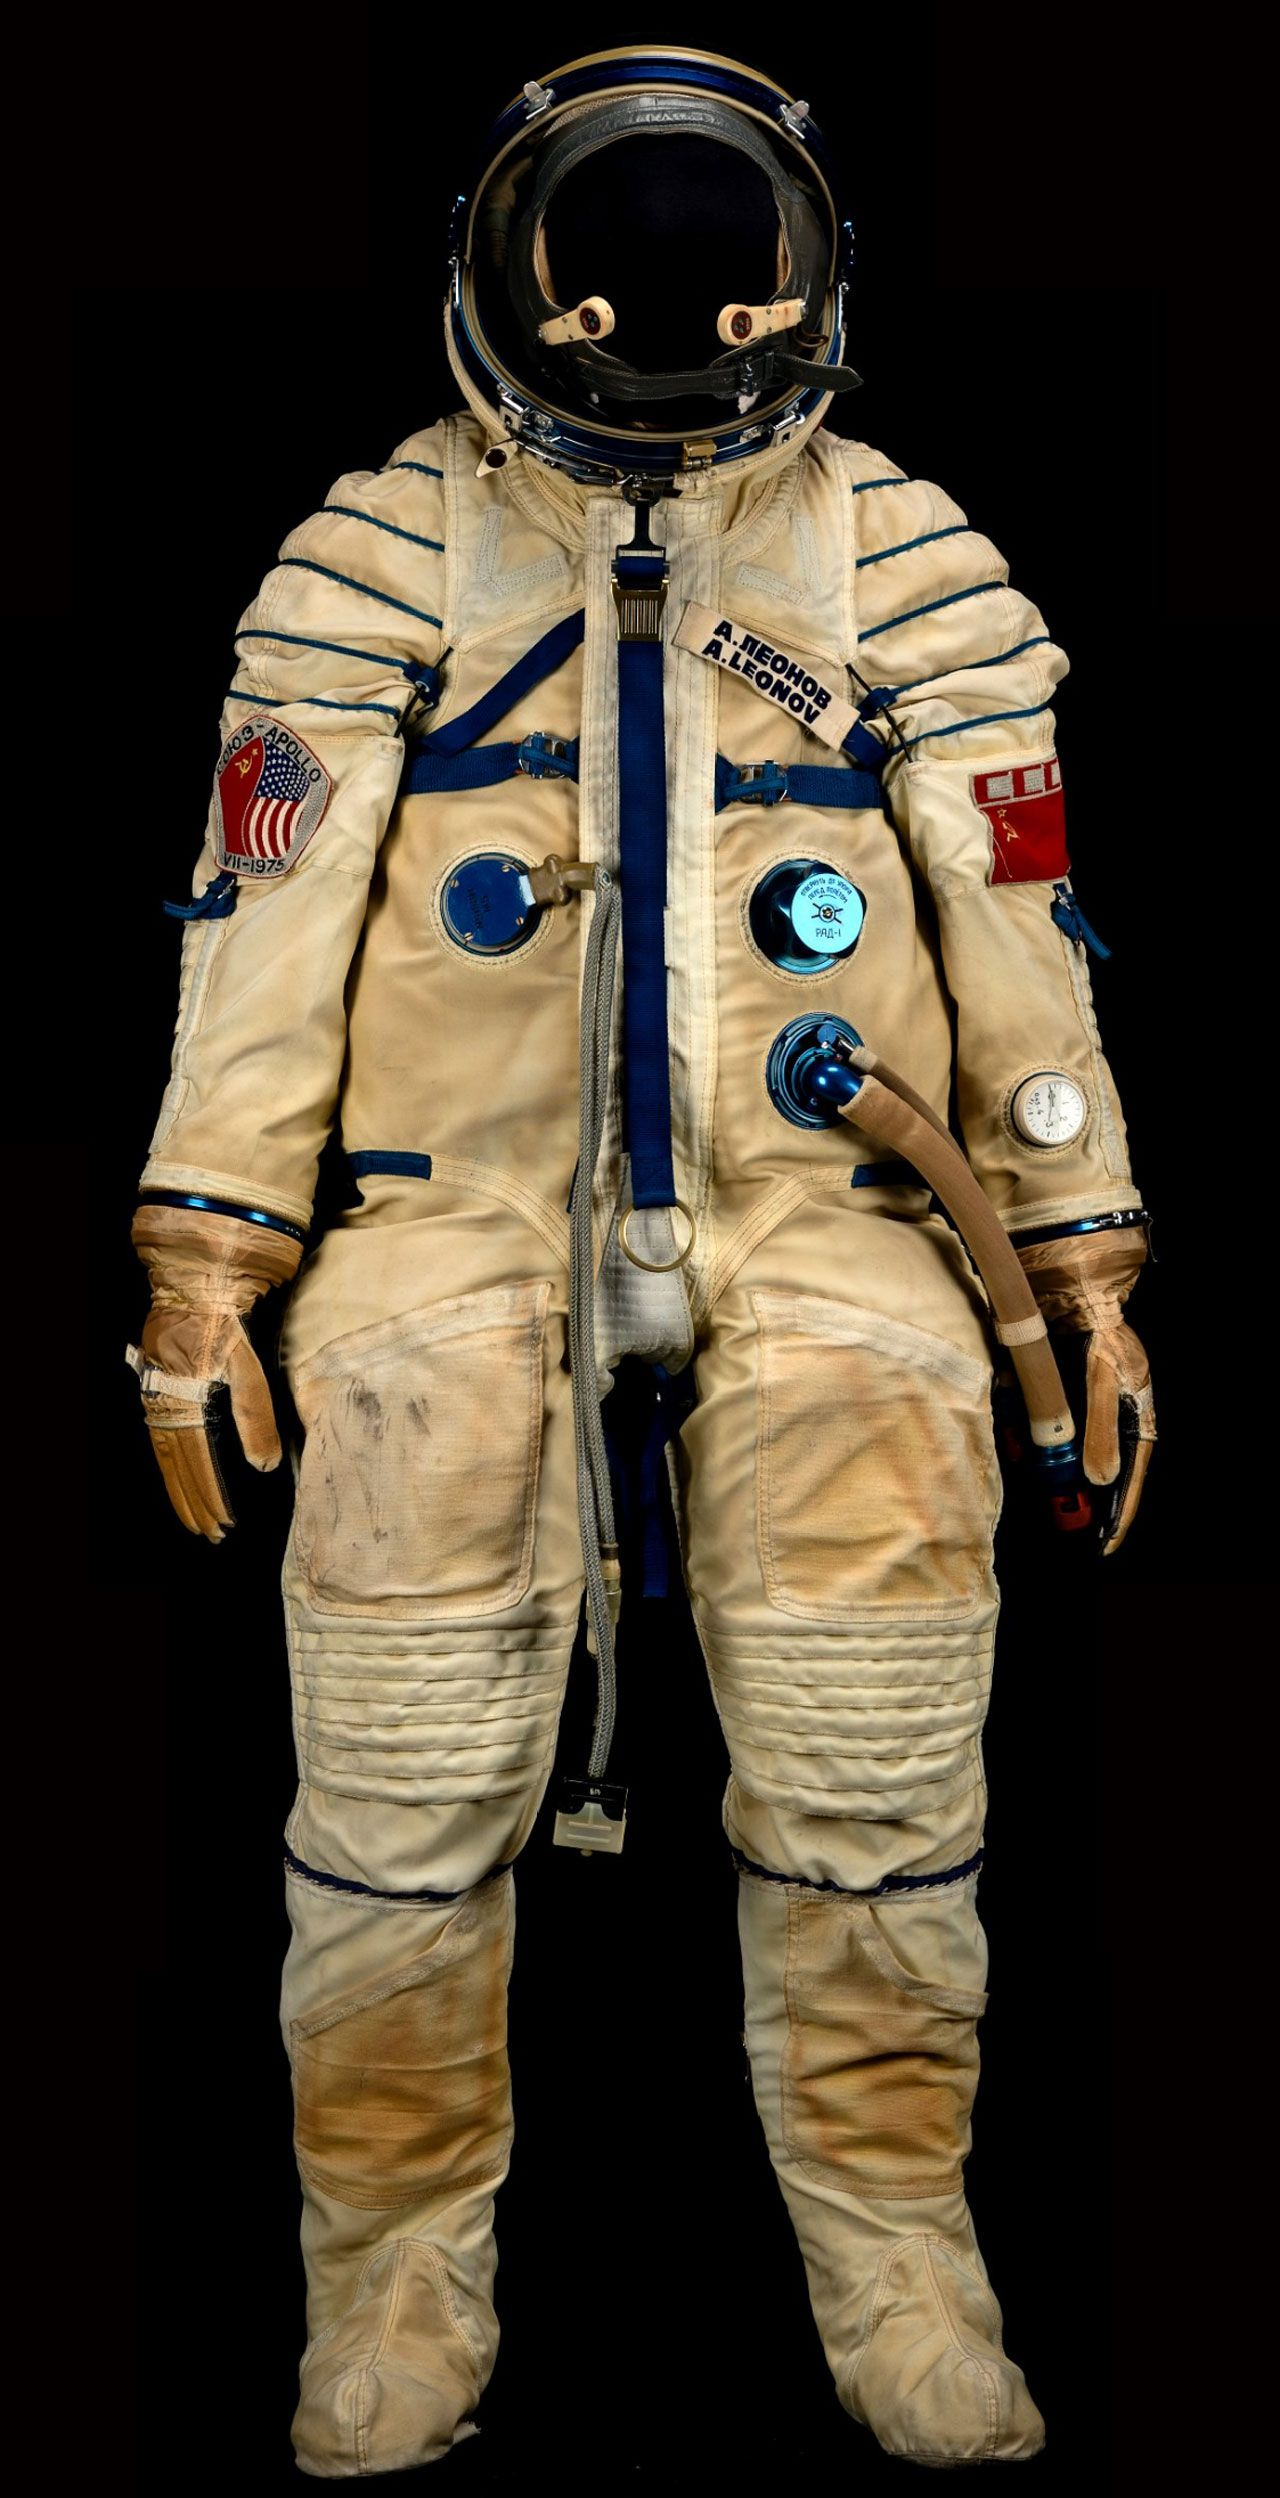 apollo 7 space suits - photo #17